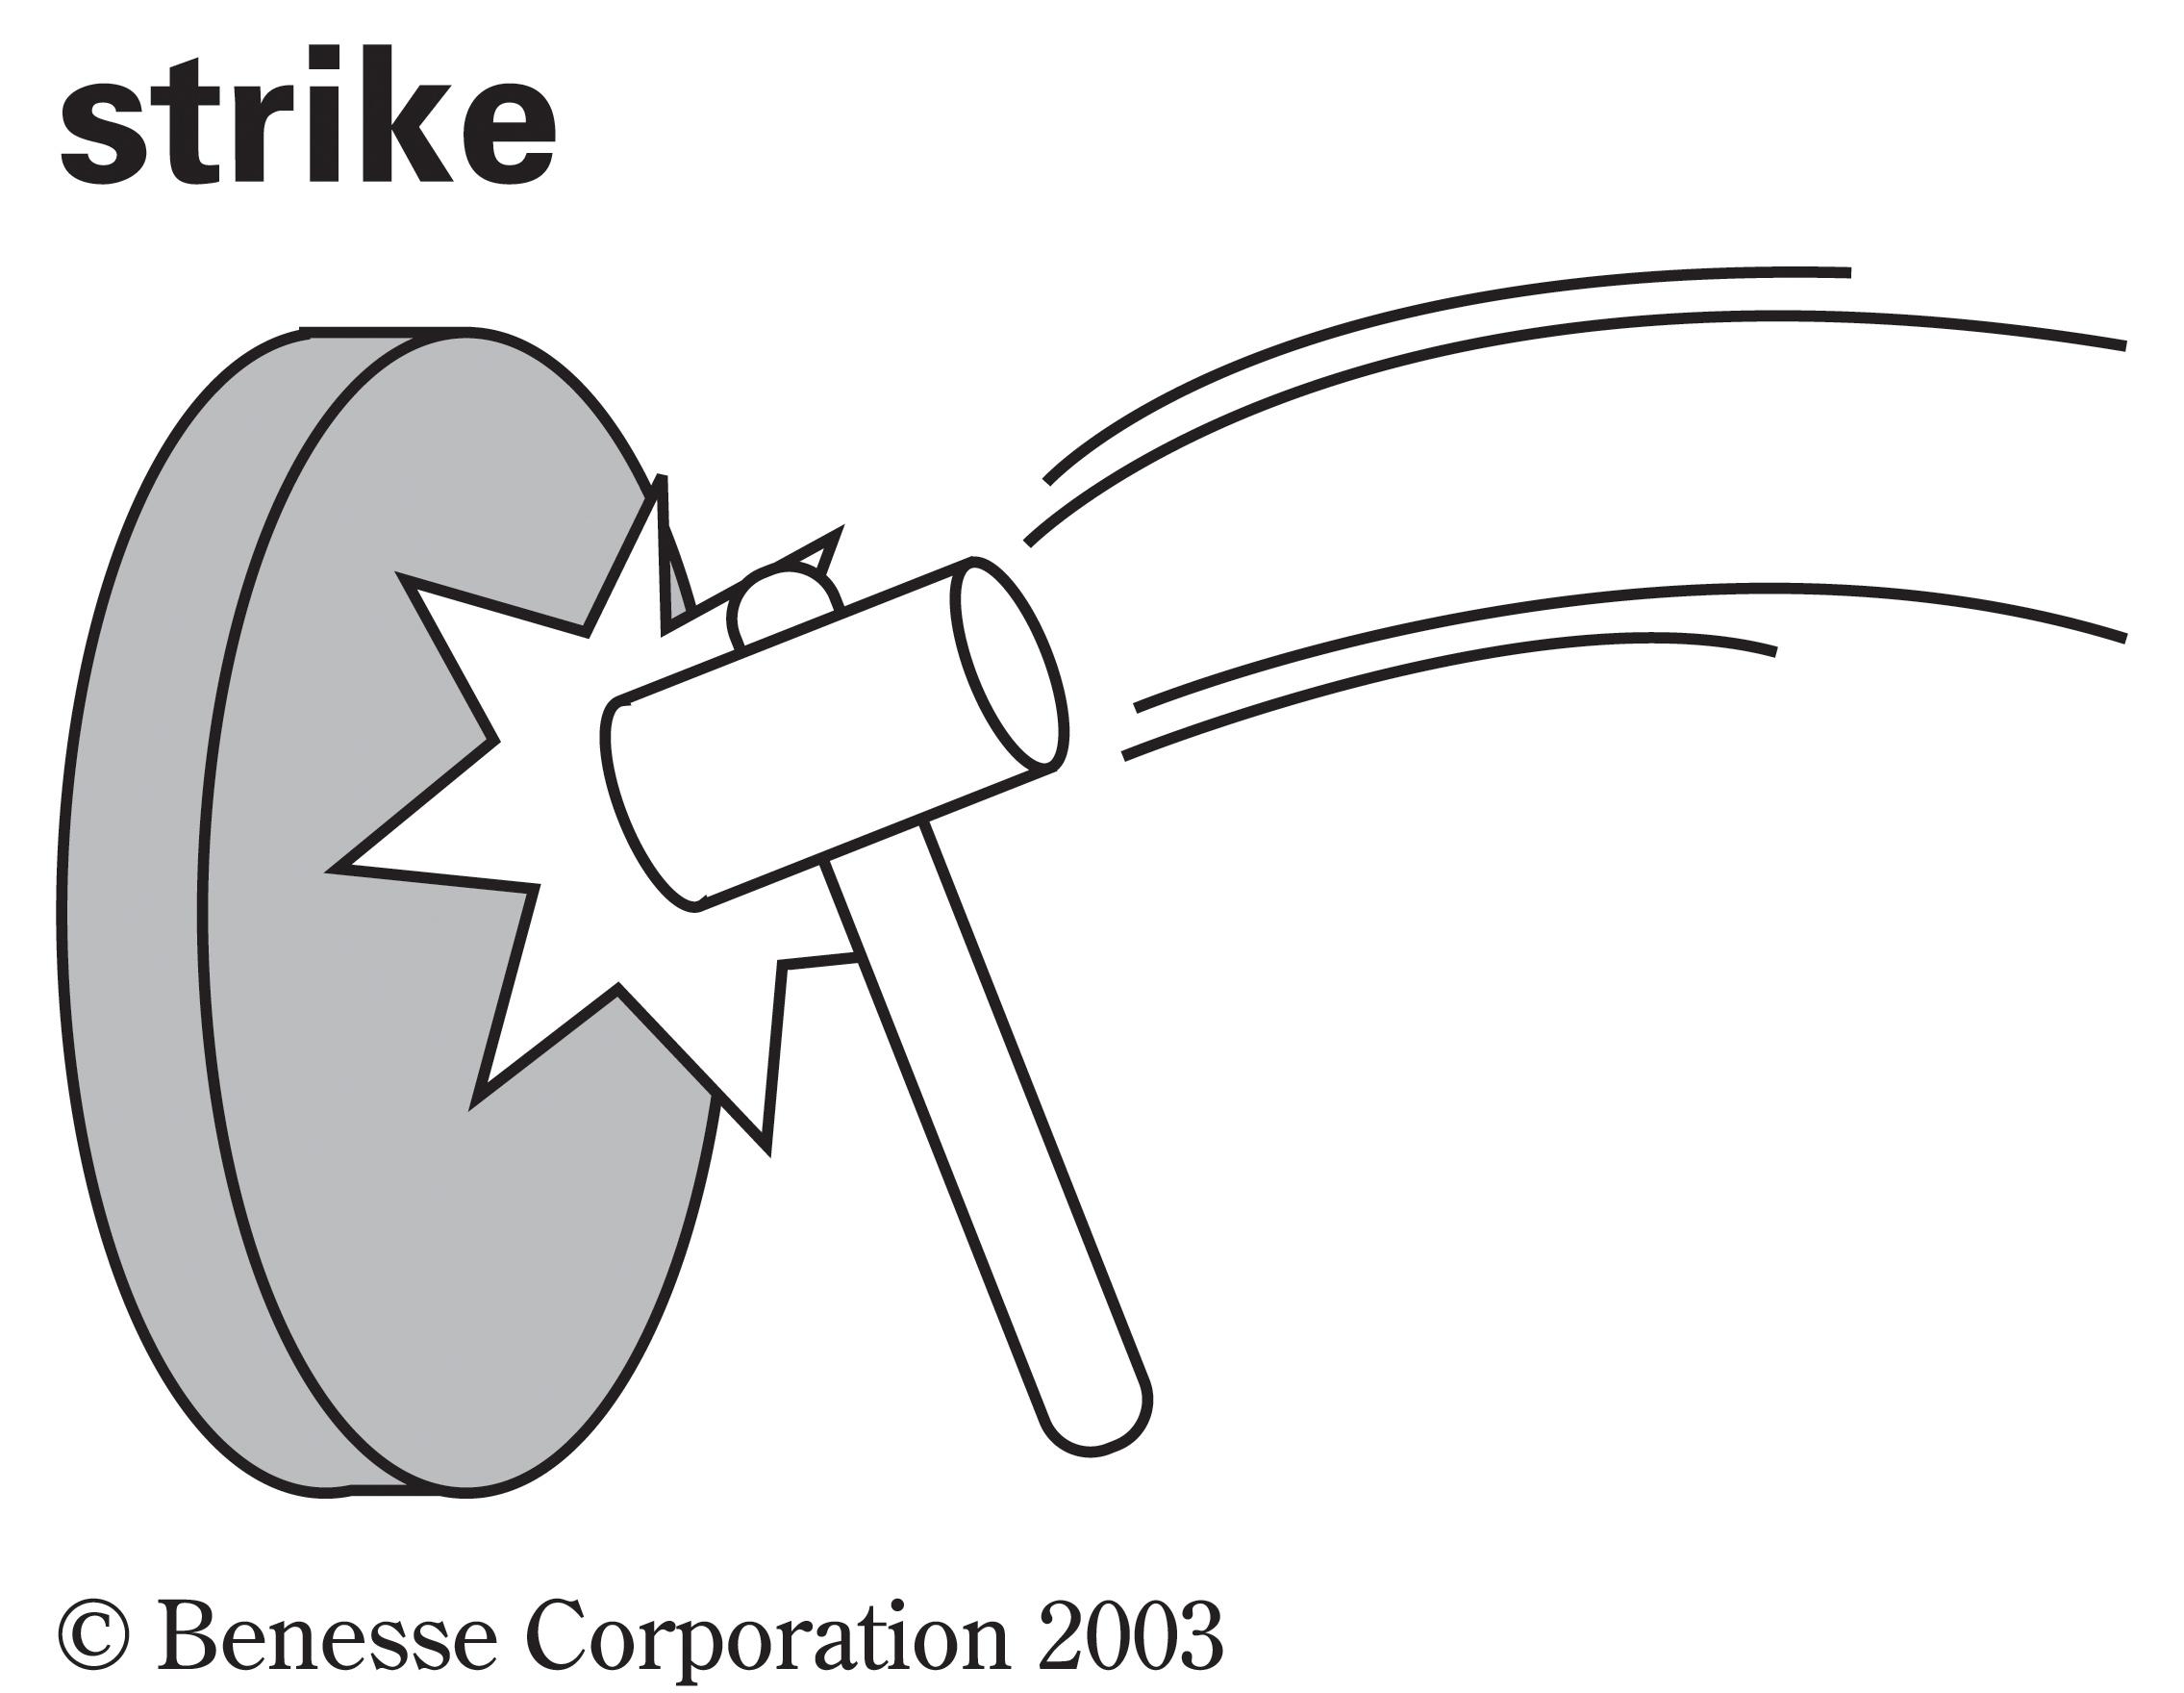 strike01.jpg